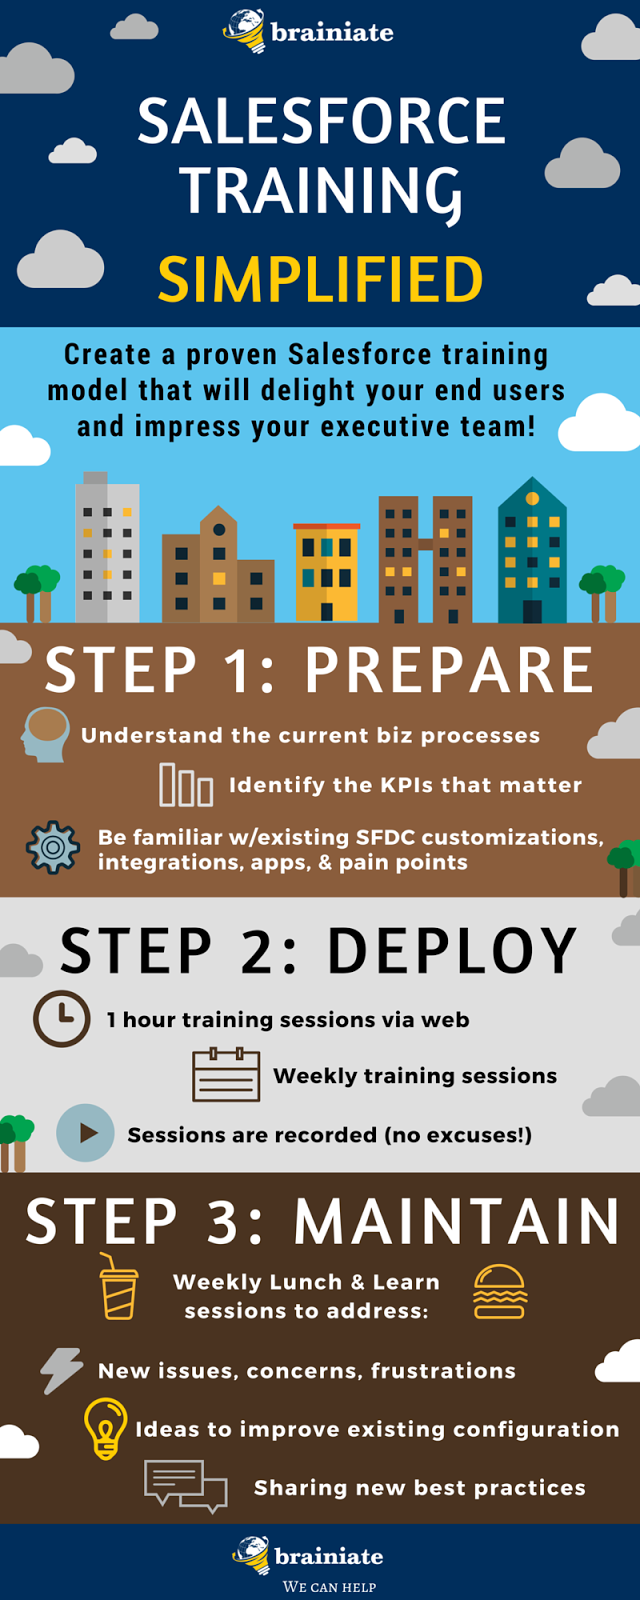 Salesforce Training Simplified